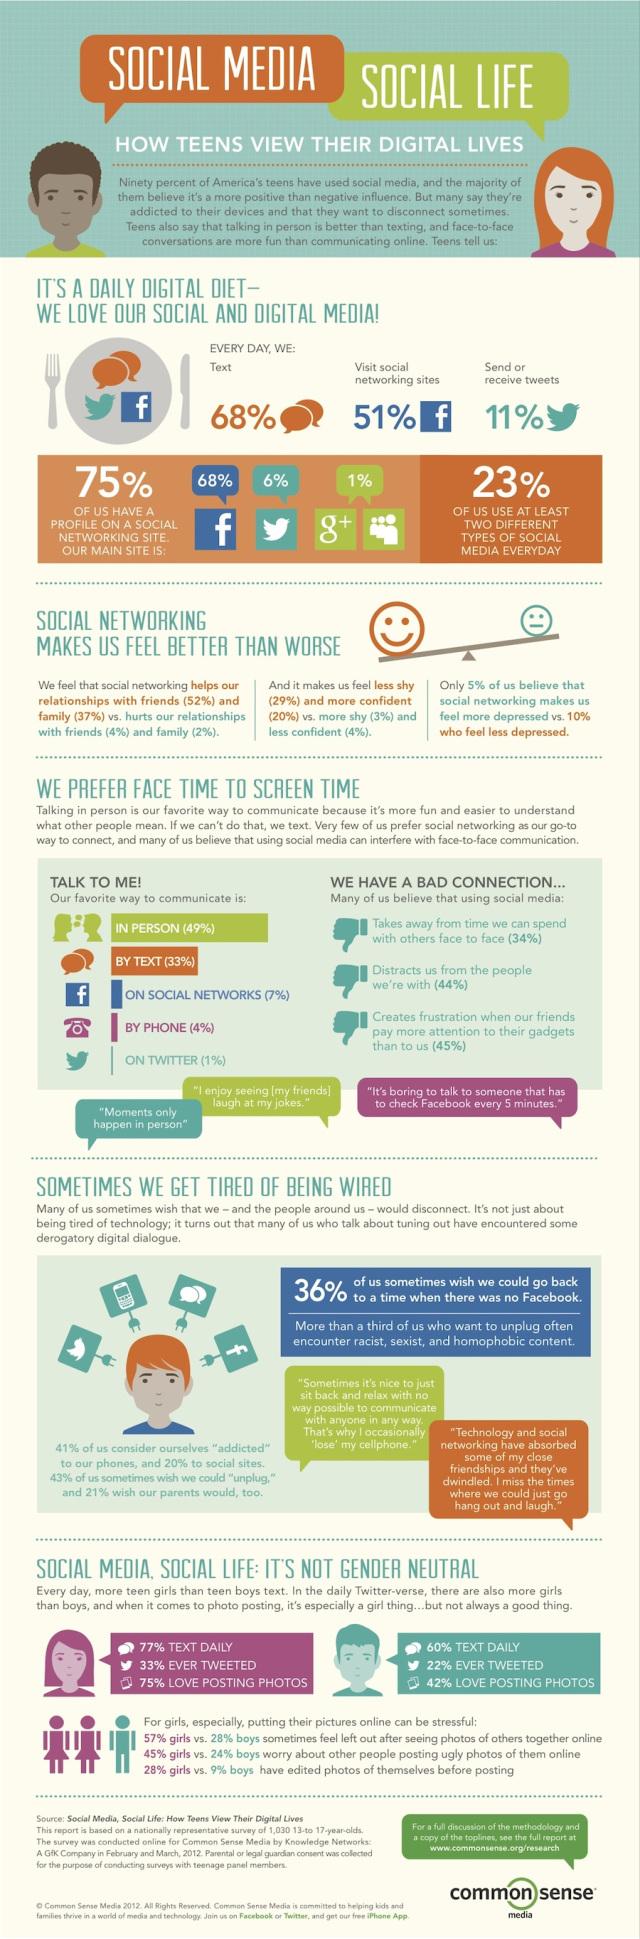 Social Media, Social Life - How Teens View Their Digital Lives - Common Sense Media 2012